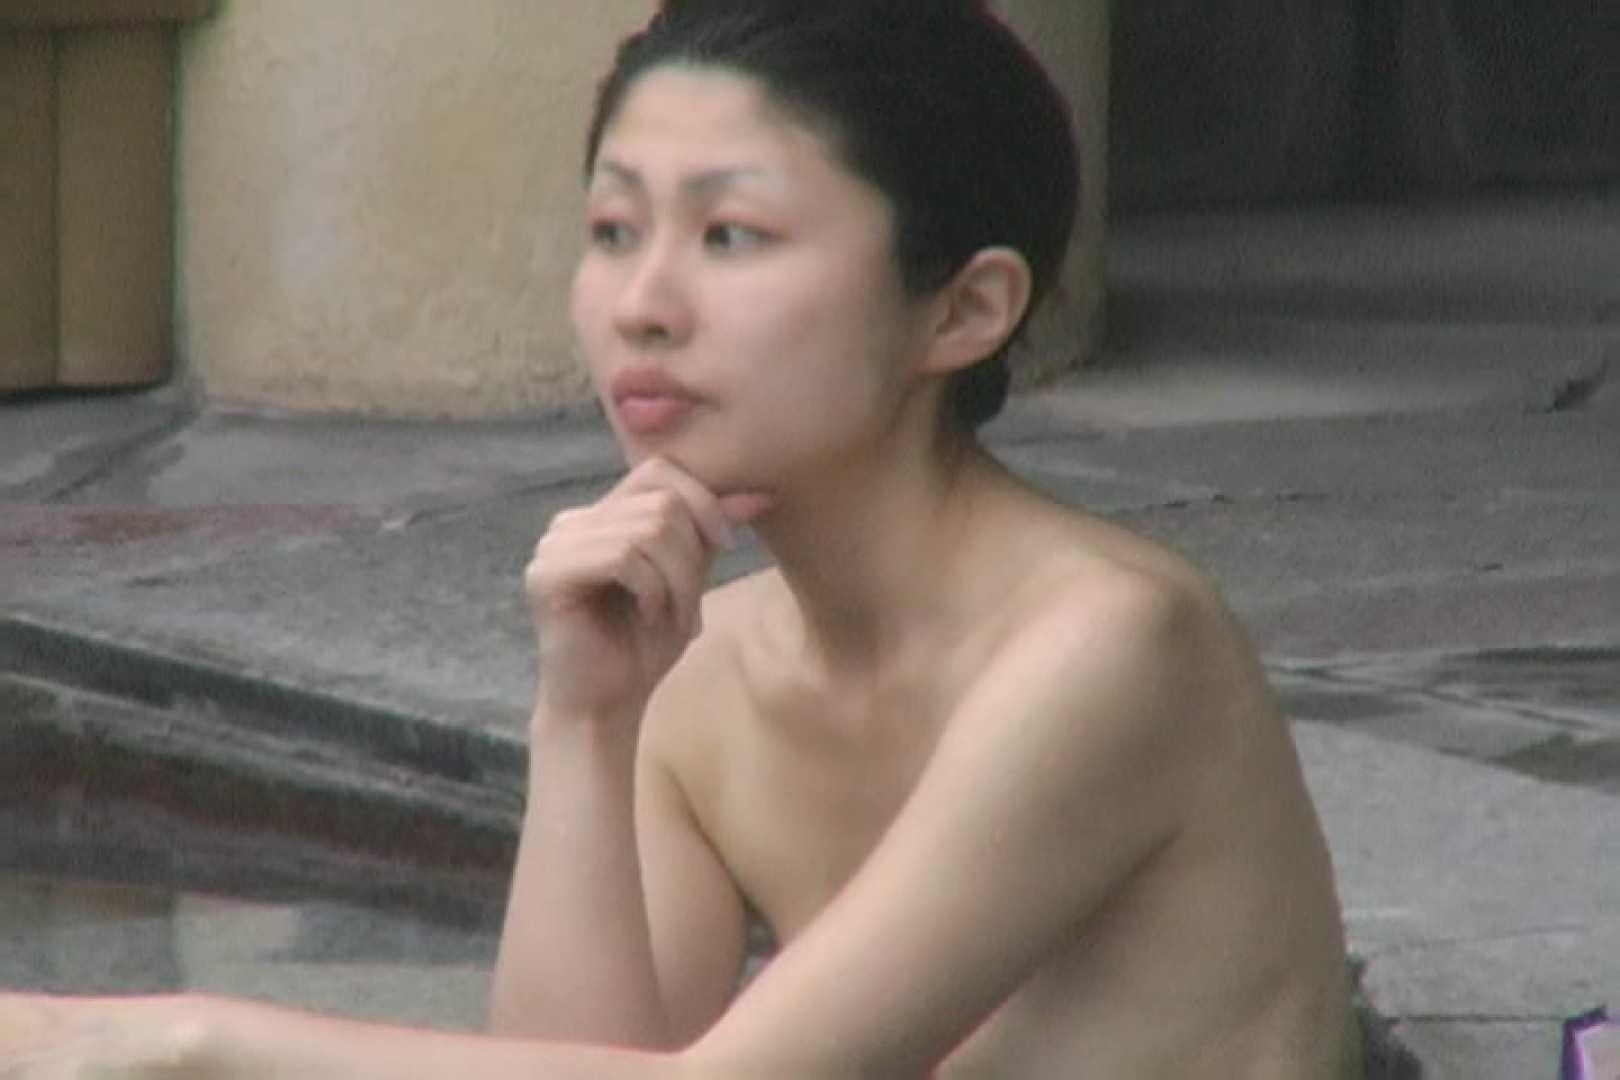 Aquaな露天風呂Vol.642 盗撮師作品 セックス画像 86pic 56